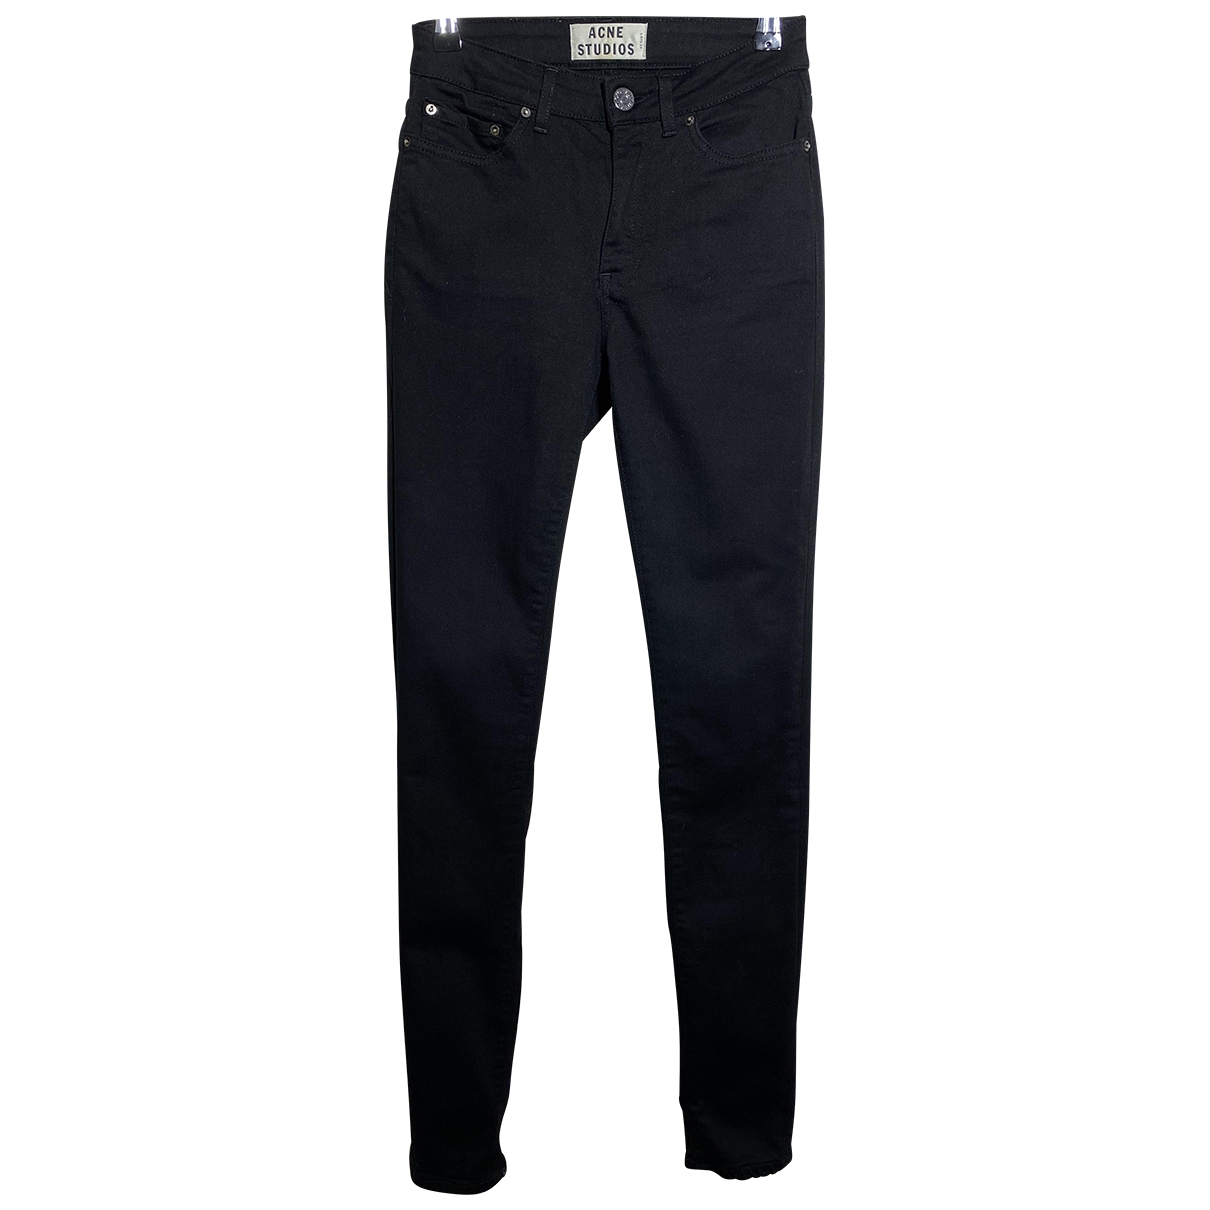 Acne Studios \N Black Cotton - elasthane Jeans for Women 32 FR